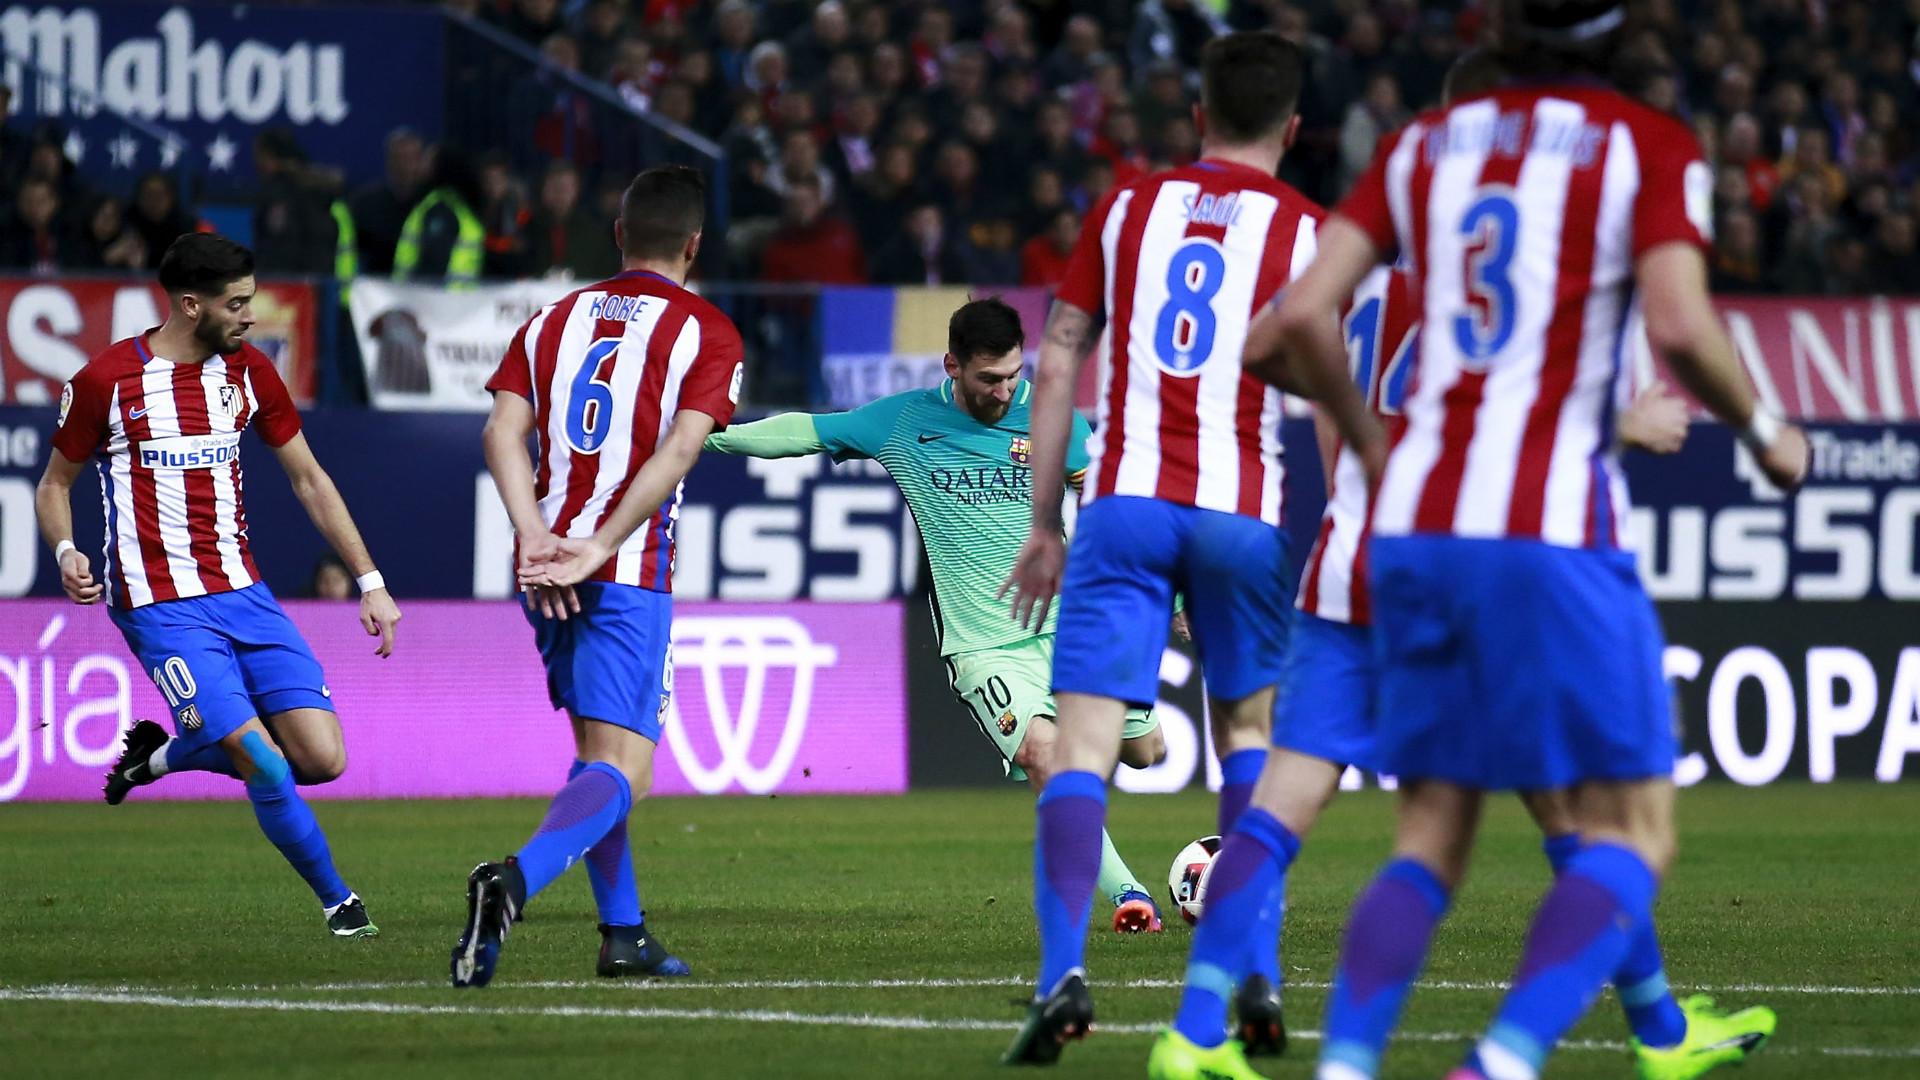 Lionel Messi Atletico Madrid Barcelona Copa del Rey